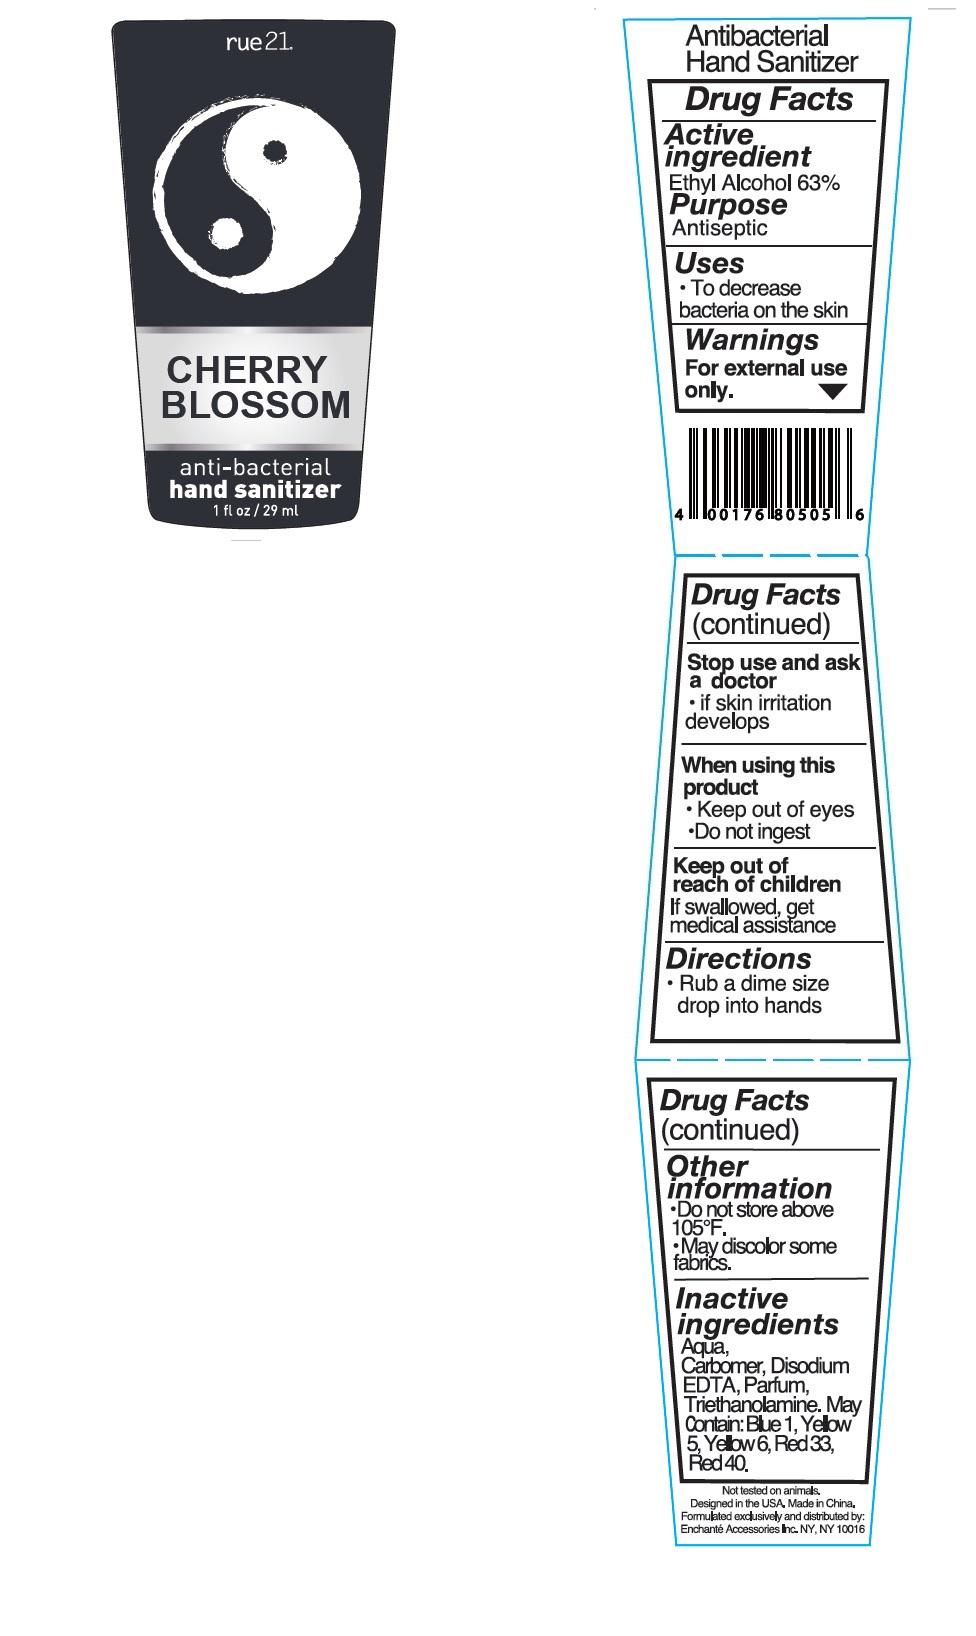 Rue21 Cherry Blossom Antibacterial Hand Sanitizer (Alcohol) Liquid [Enchante Accessories Inc. ]